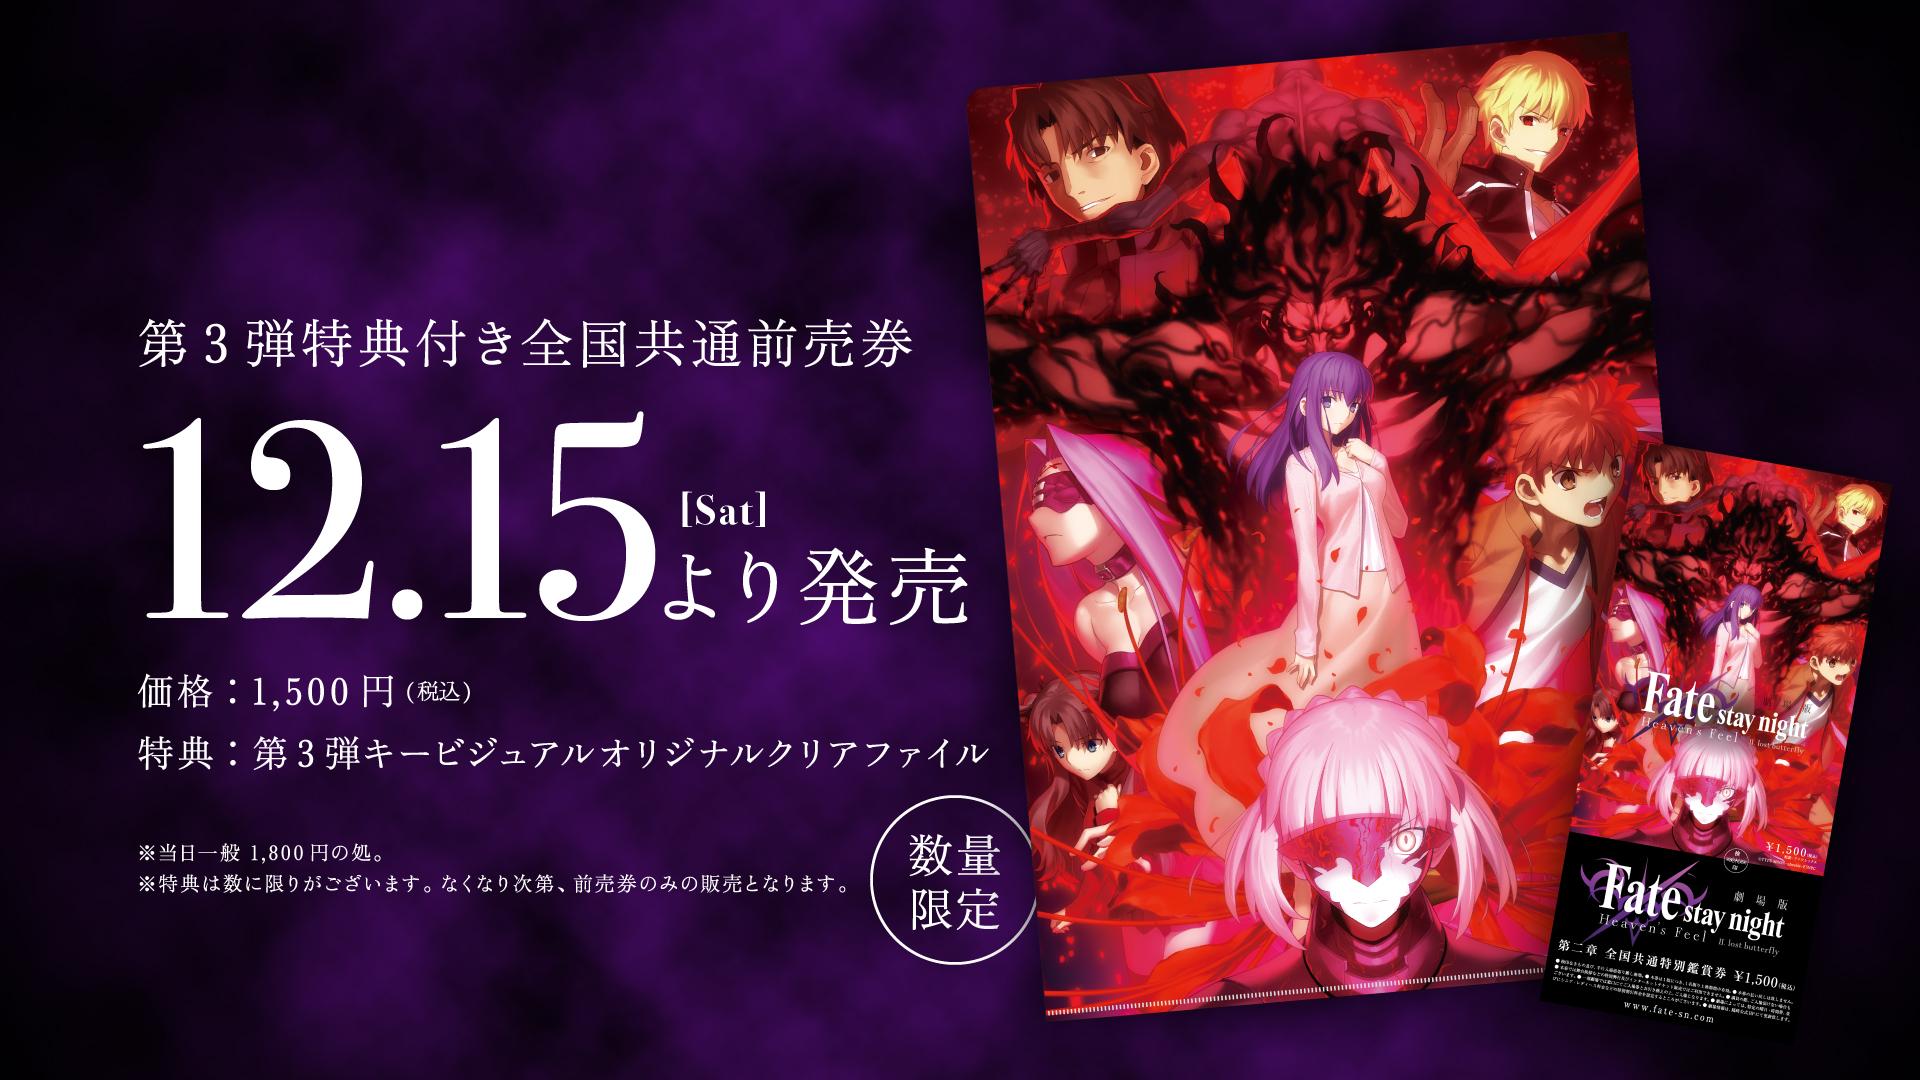 劇場版 Fate Stay Night 第3弾特典付き全国共通前売券発売